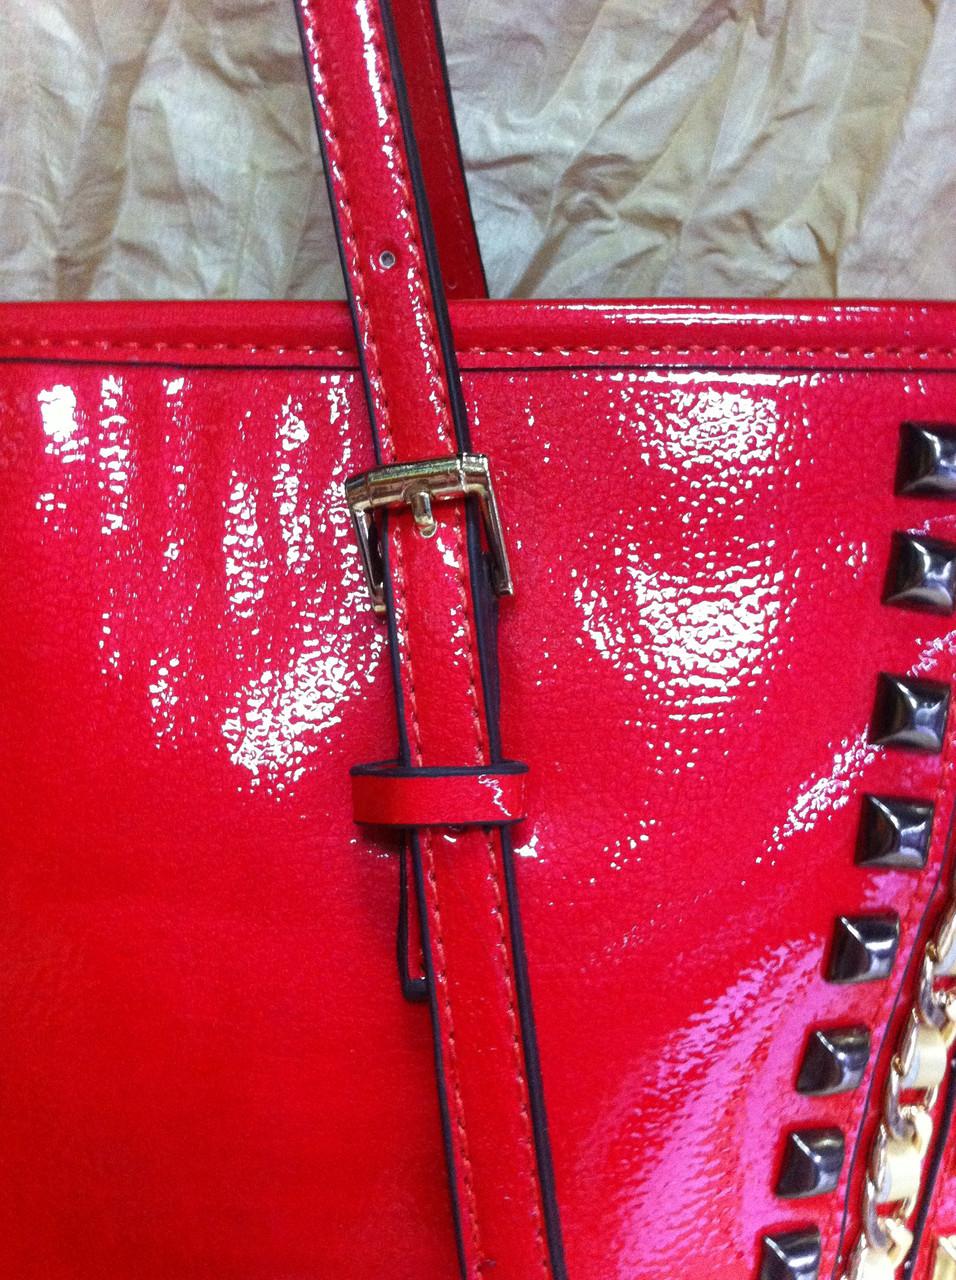 af5b50e645d7 Красная лаковая сумка с шипами, цена 821,60 грн., купить в Харькове —  Prom.ua (ID#748786689)